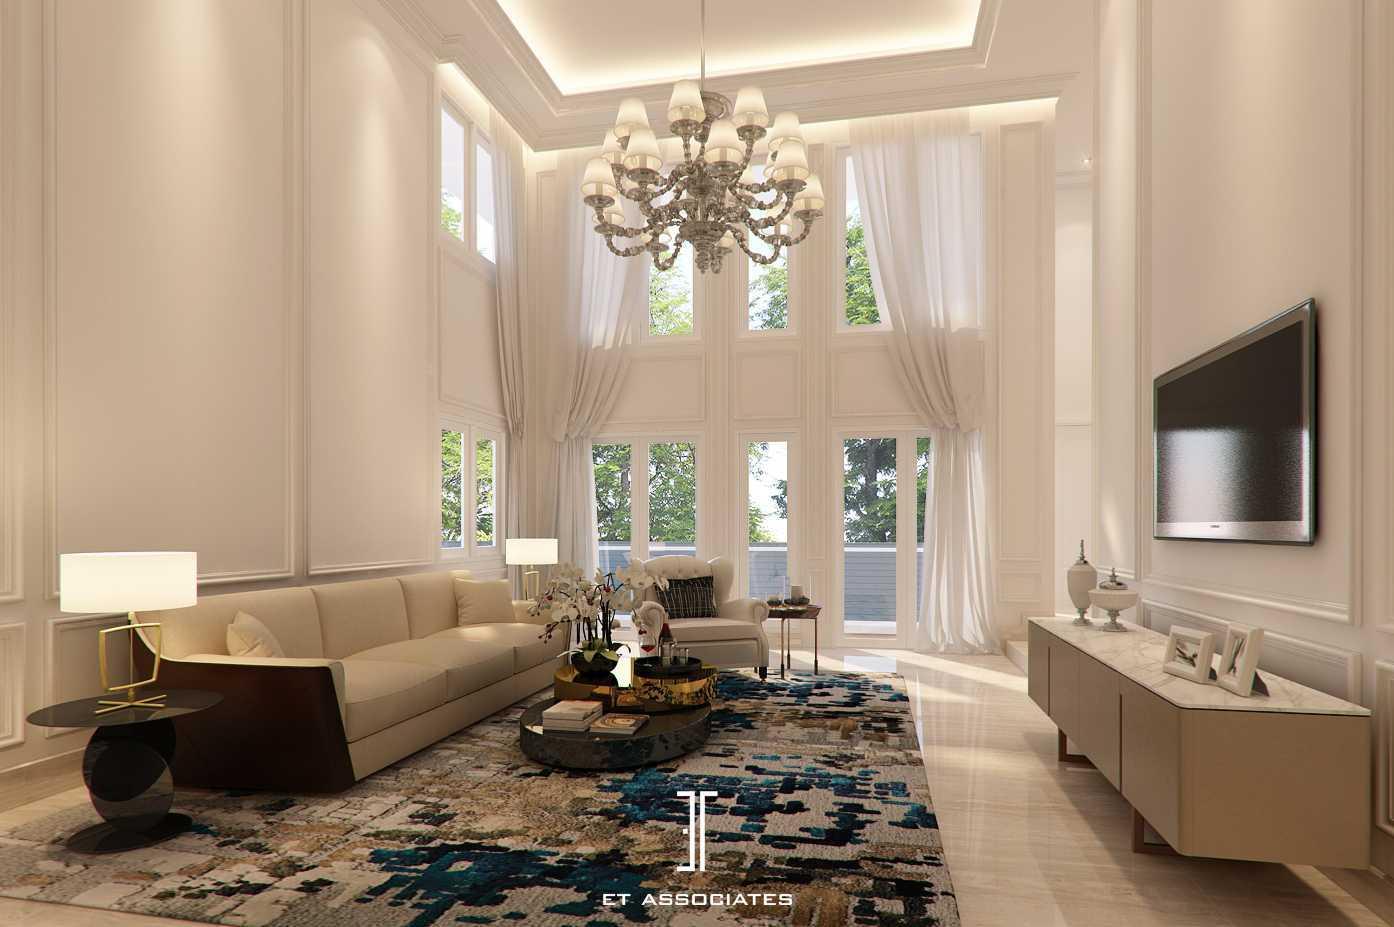 Et Associates Private Residential At Gandaria Jakarta, Indonesia  Bendi-1 Klasik 34098